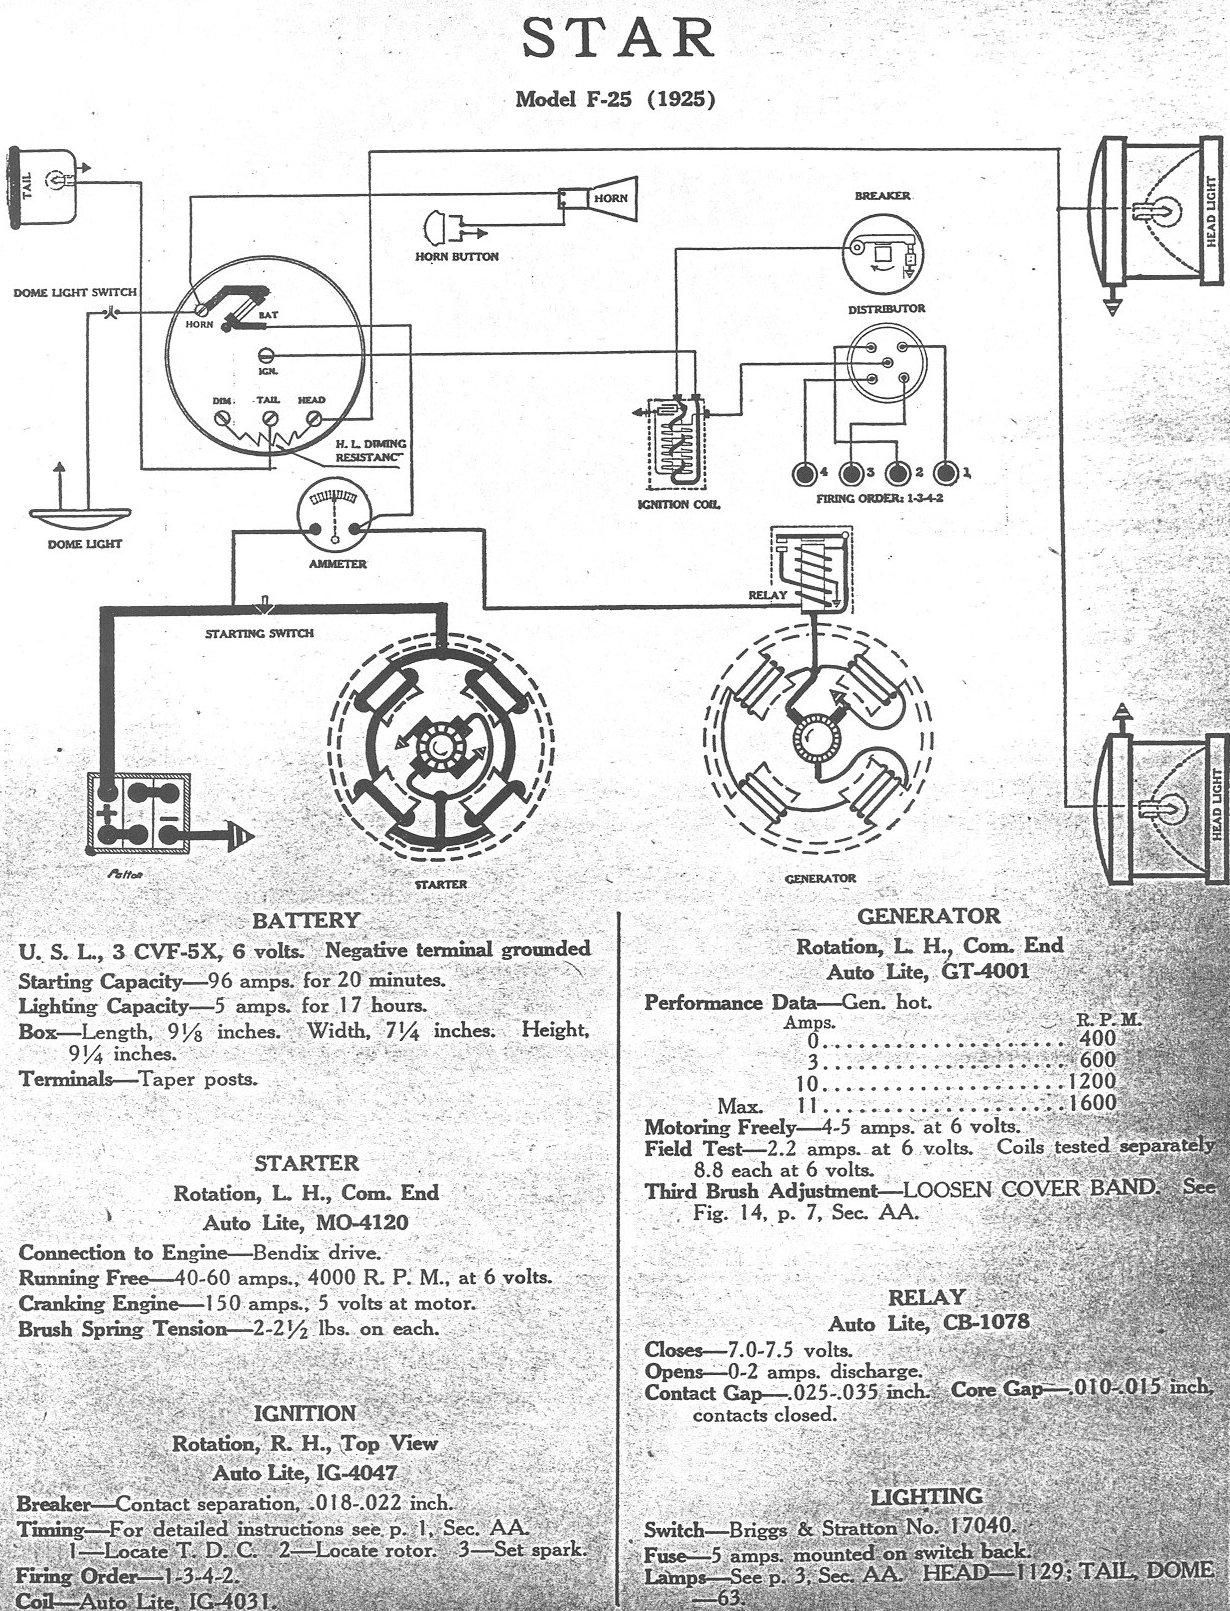 Stupendous 1929 Ford Roadster Wiring Diagram Wiring Diagram Mega Wiring Cloud Rometaidewilluminateatxorg